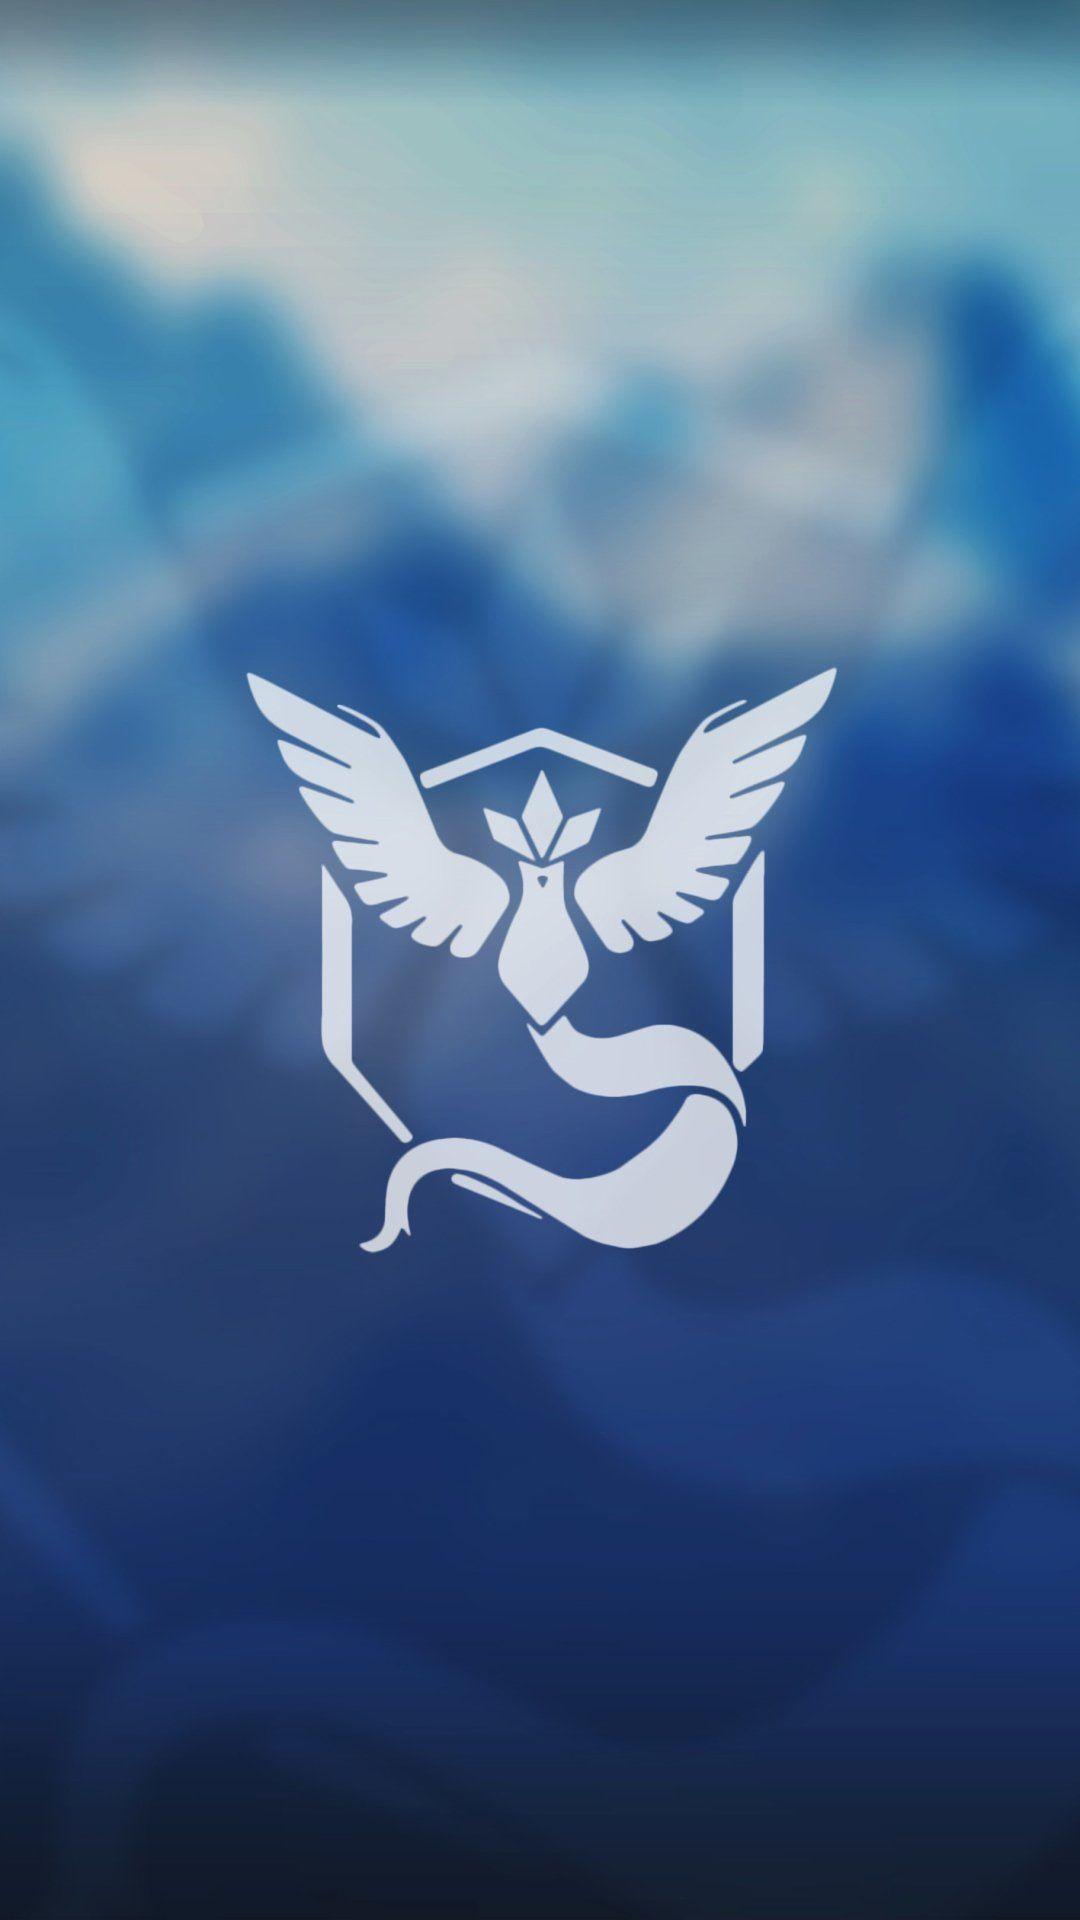 Wallpaper HD para celular Pokémon Go Team Mystic